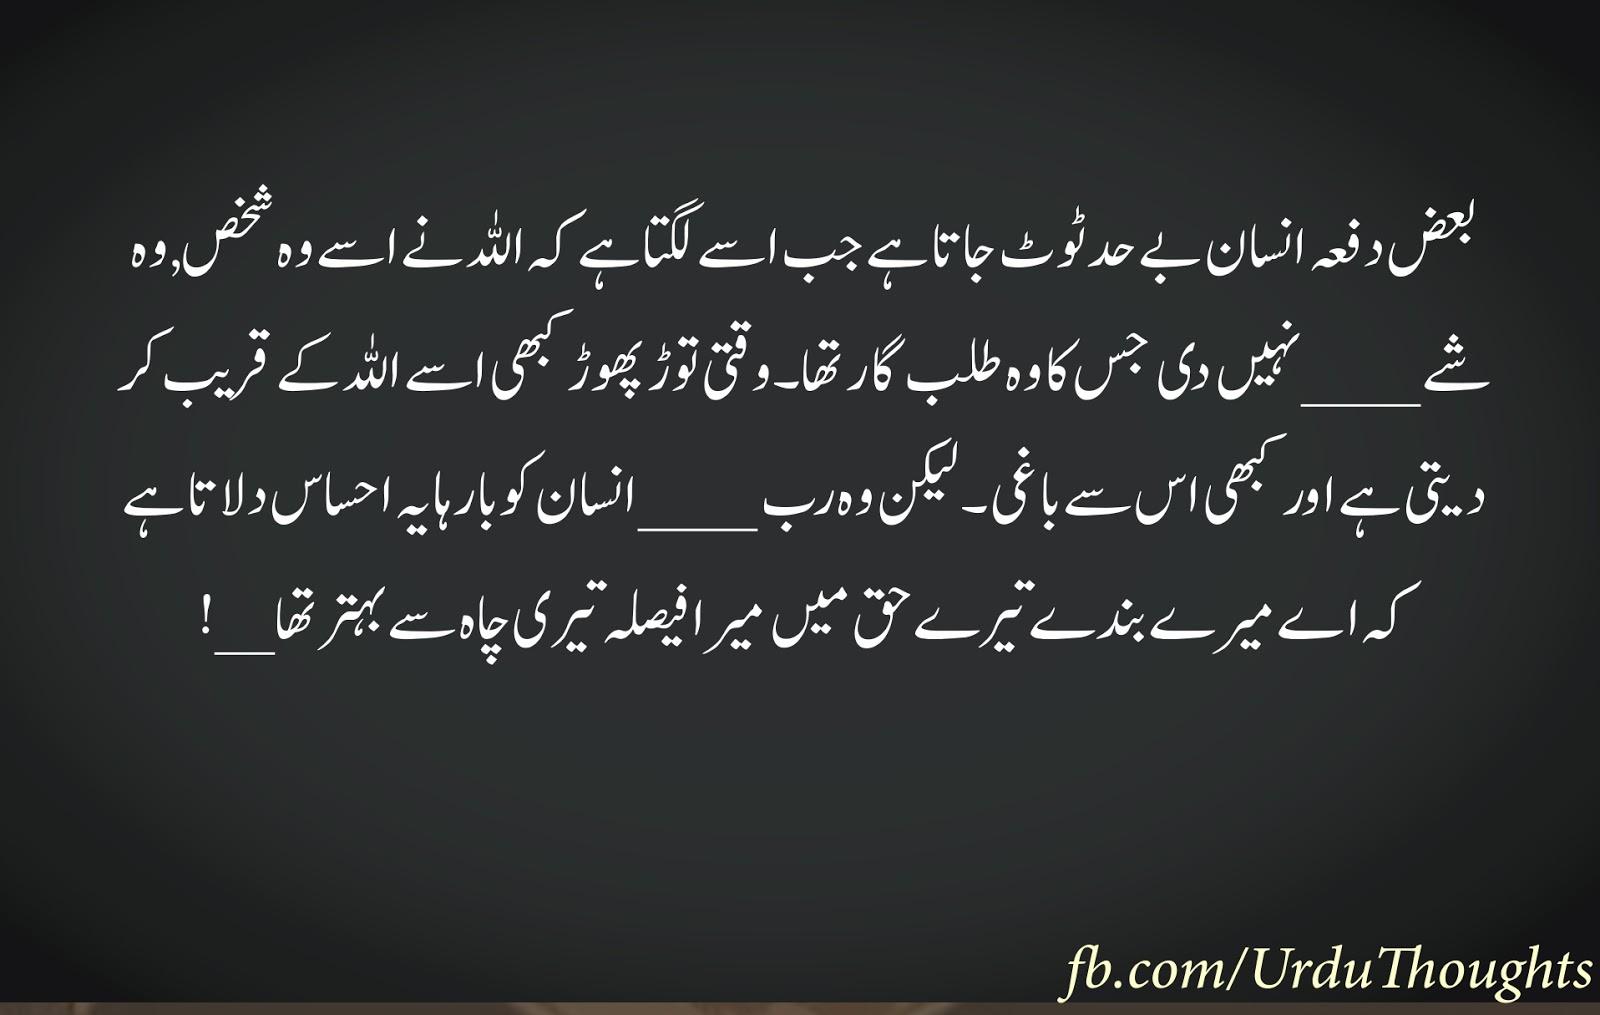 Famous Urdu Quotes About People Life Zindagi - Urdu Thoughts